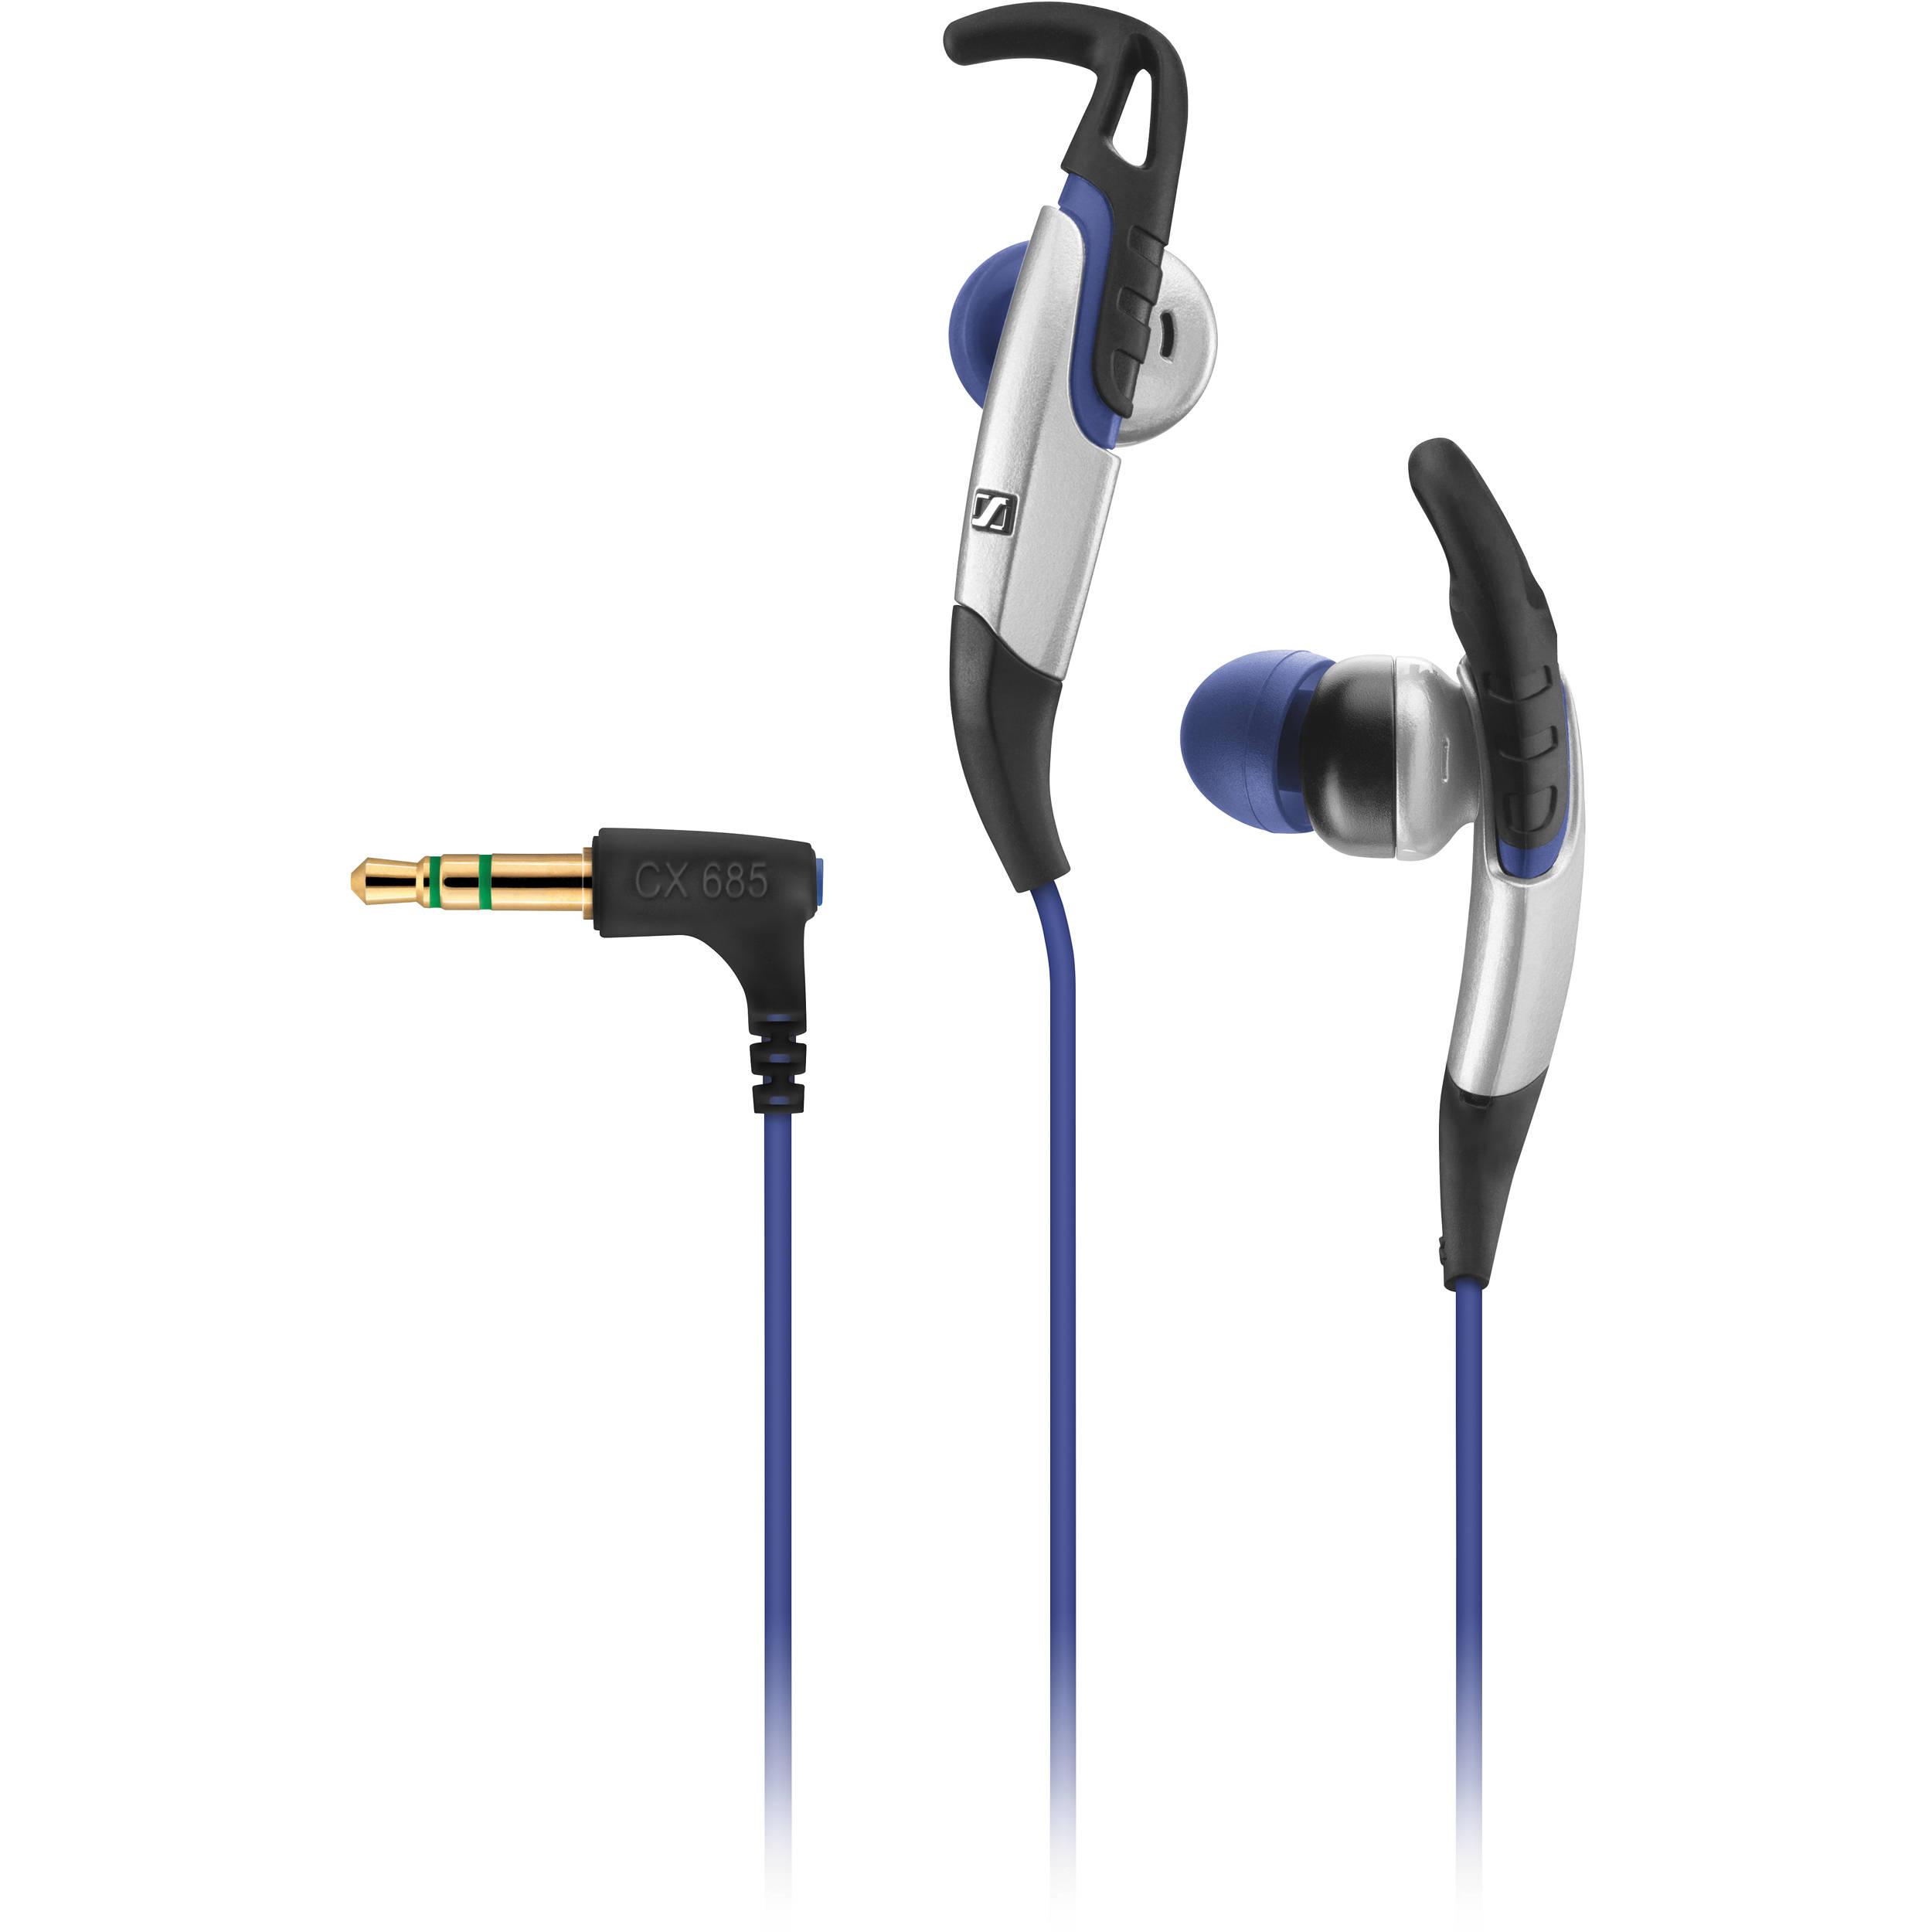 Sennheiser CX685 Adidas Sports In Ear Headphones